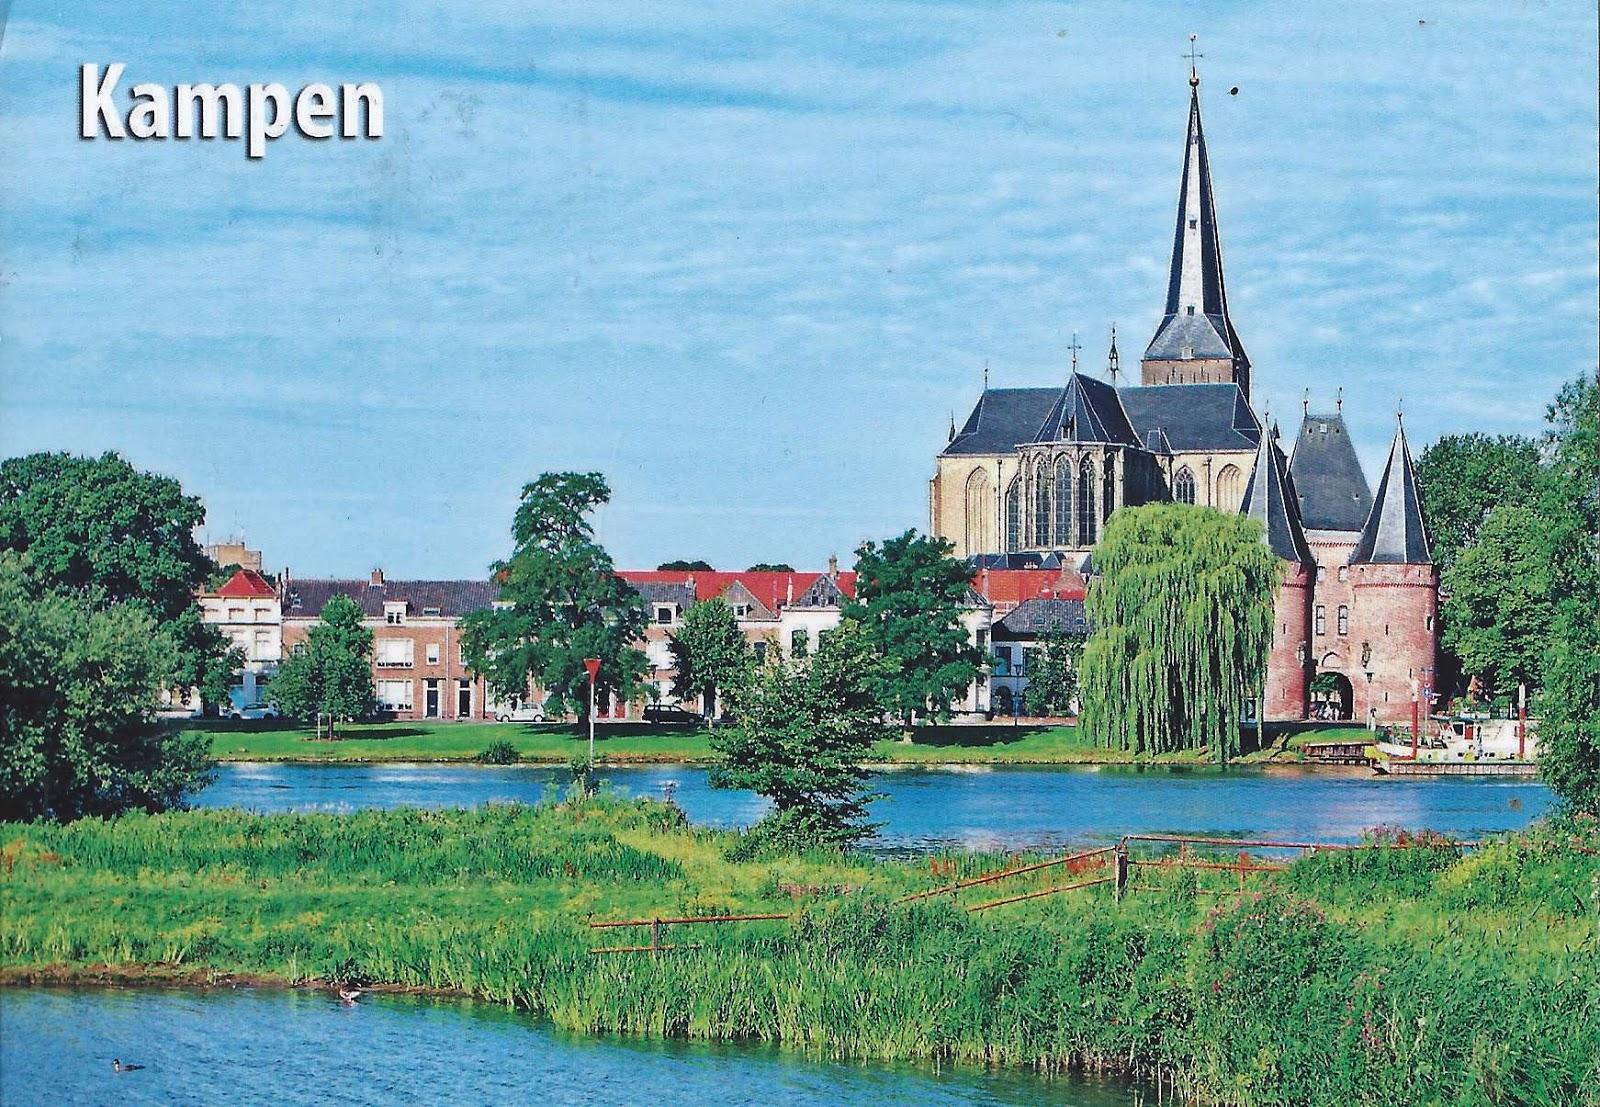 A Journey of Postcards: Hanseatic League member Kampen ...